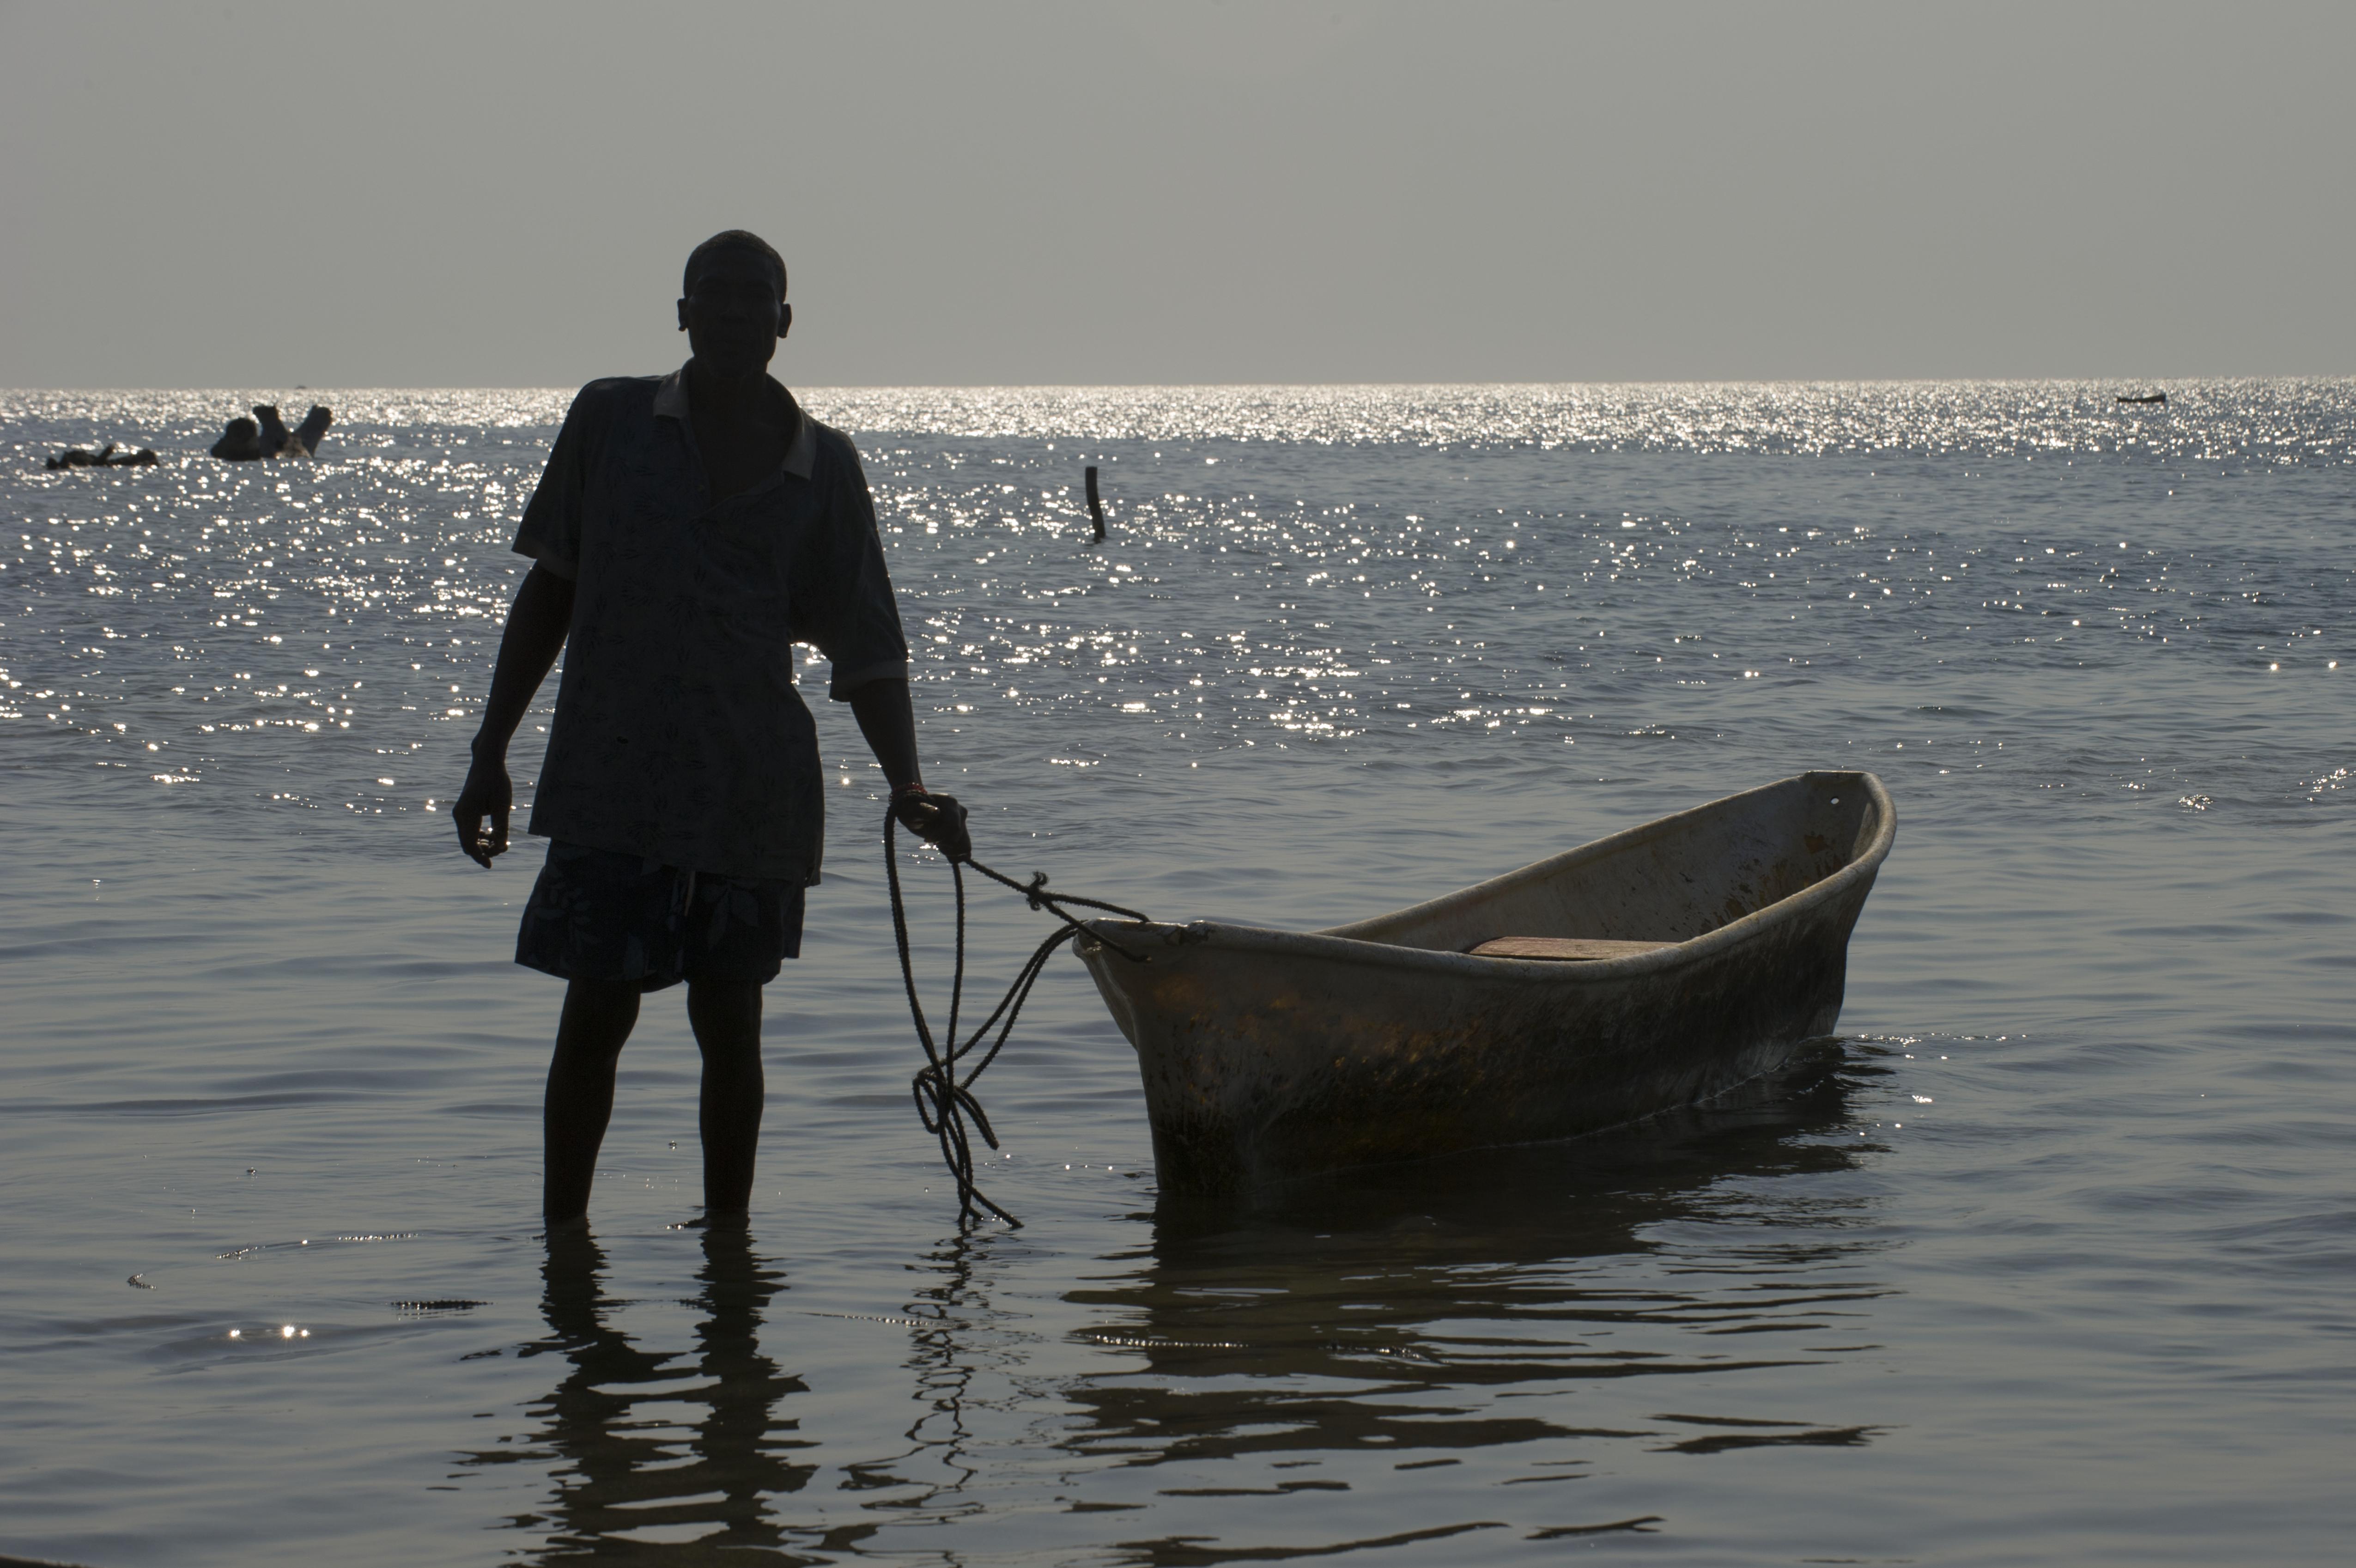 Garifuna Indigenous man